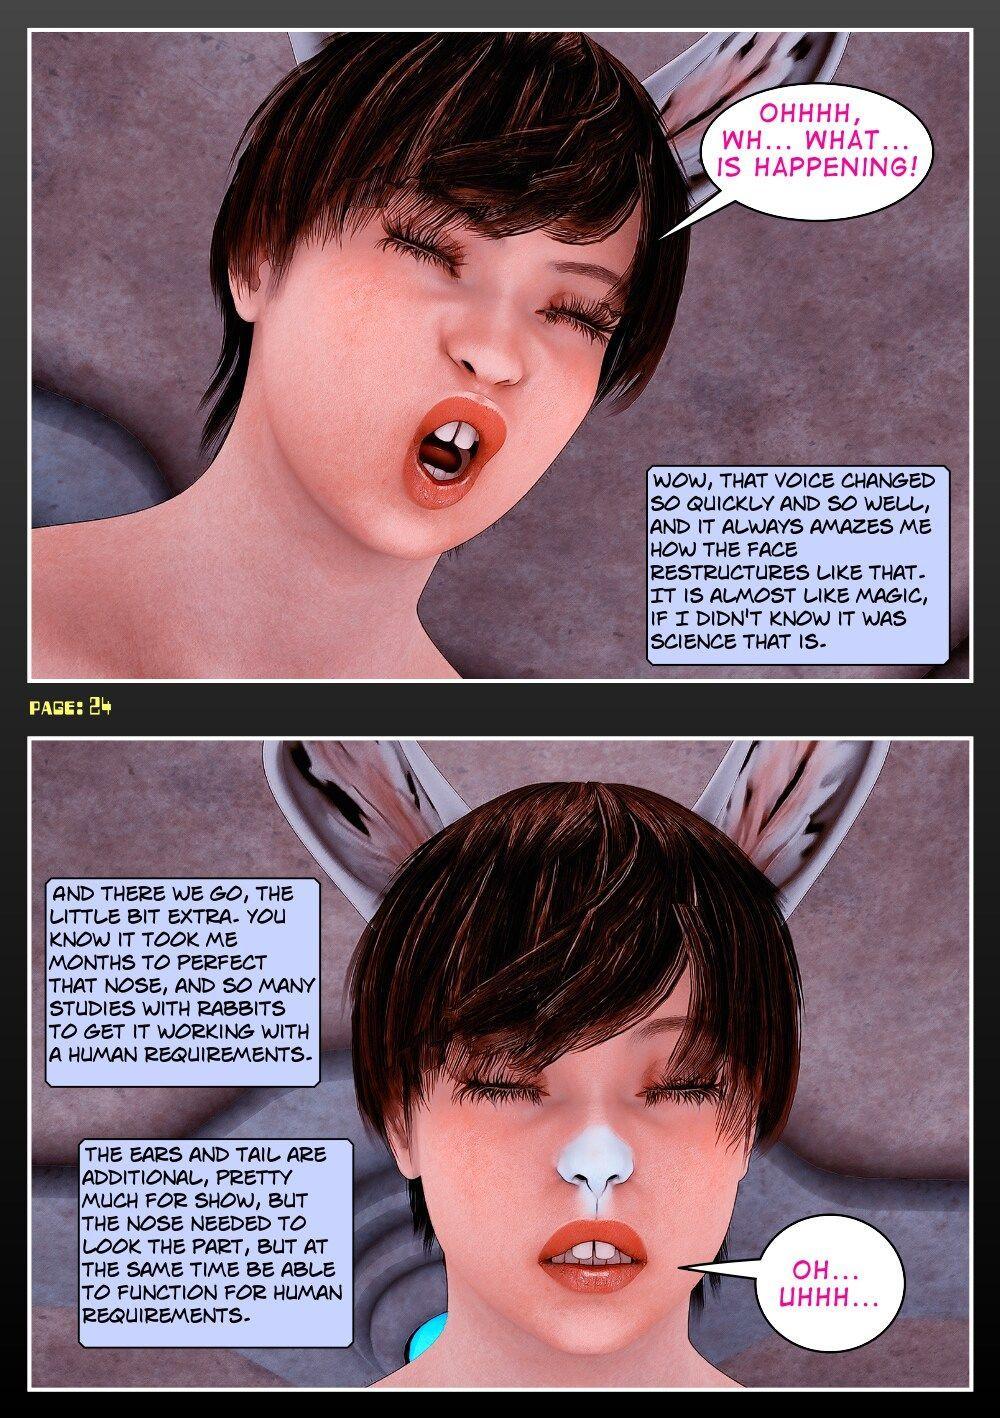 [Goldendawn] Bunny Nano Virus - part 2